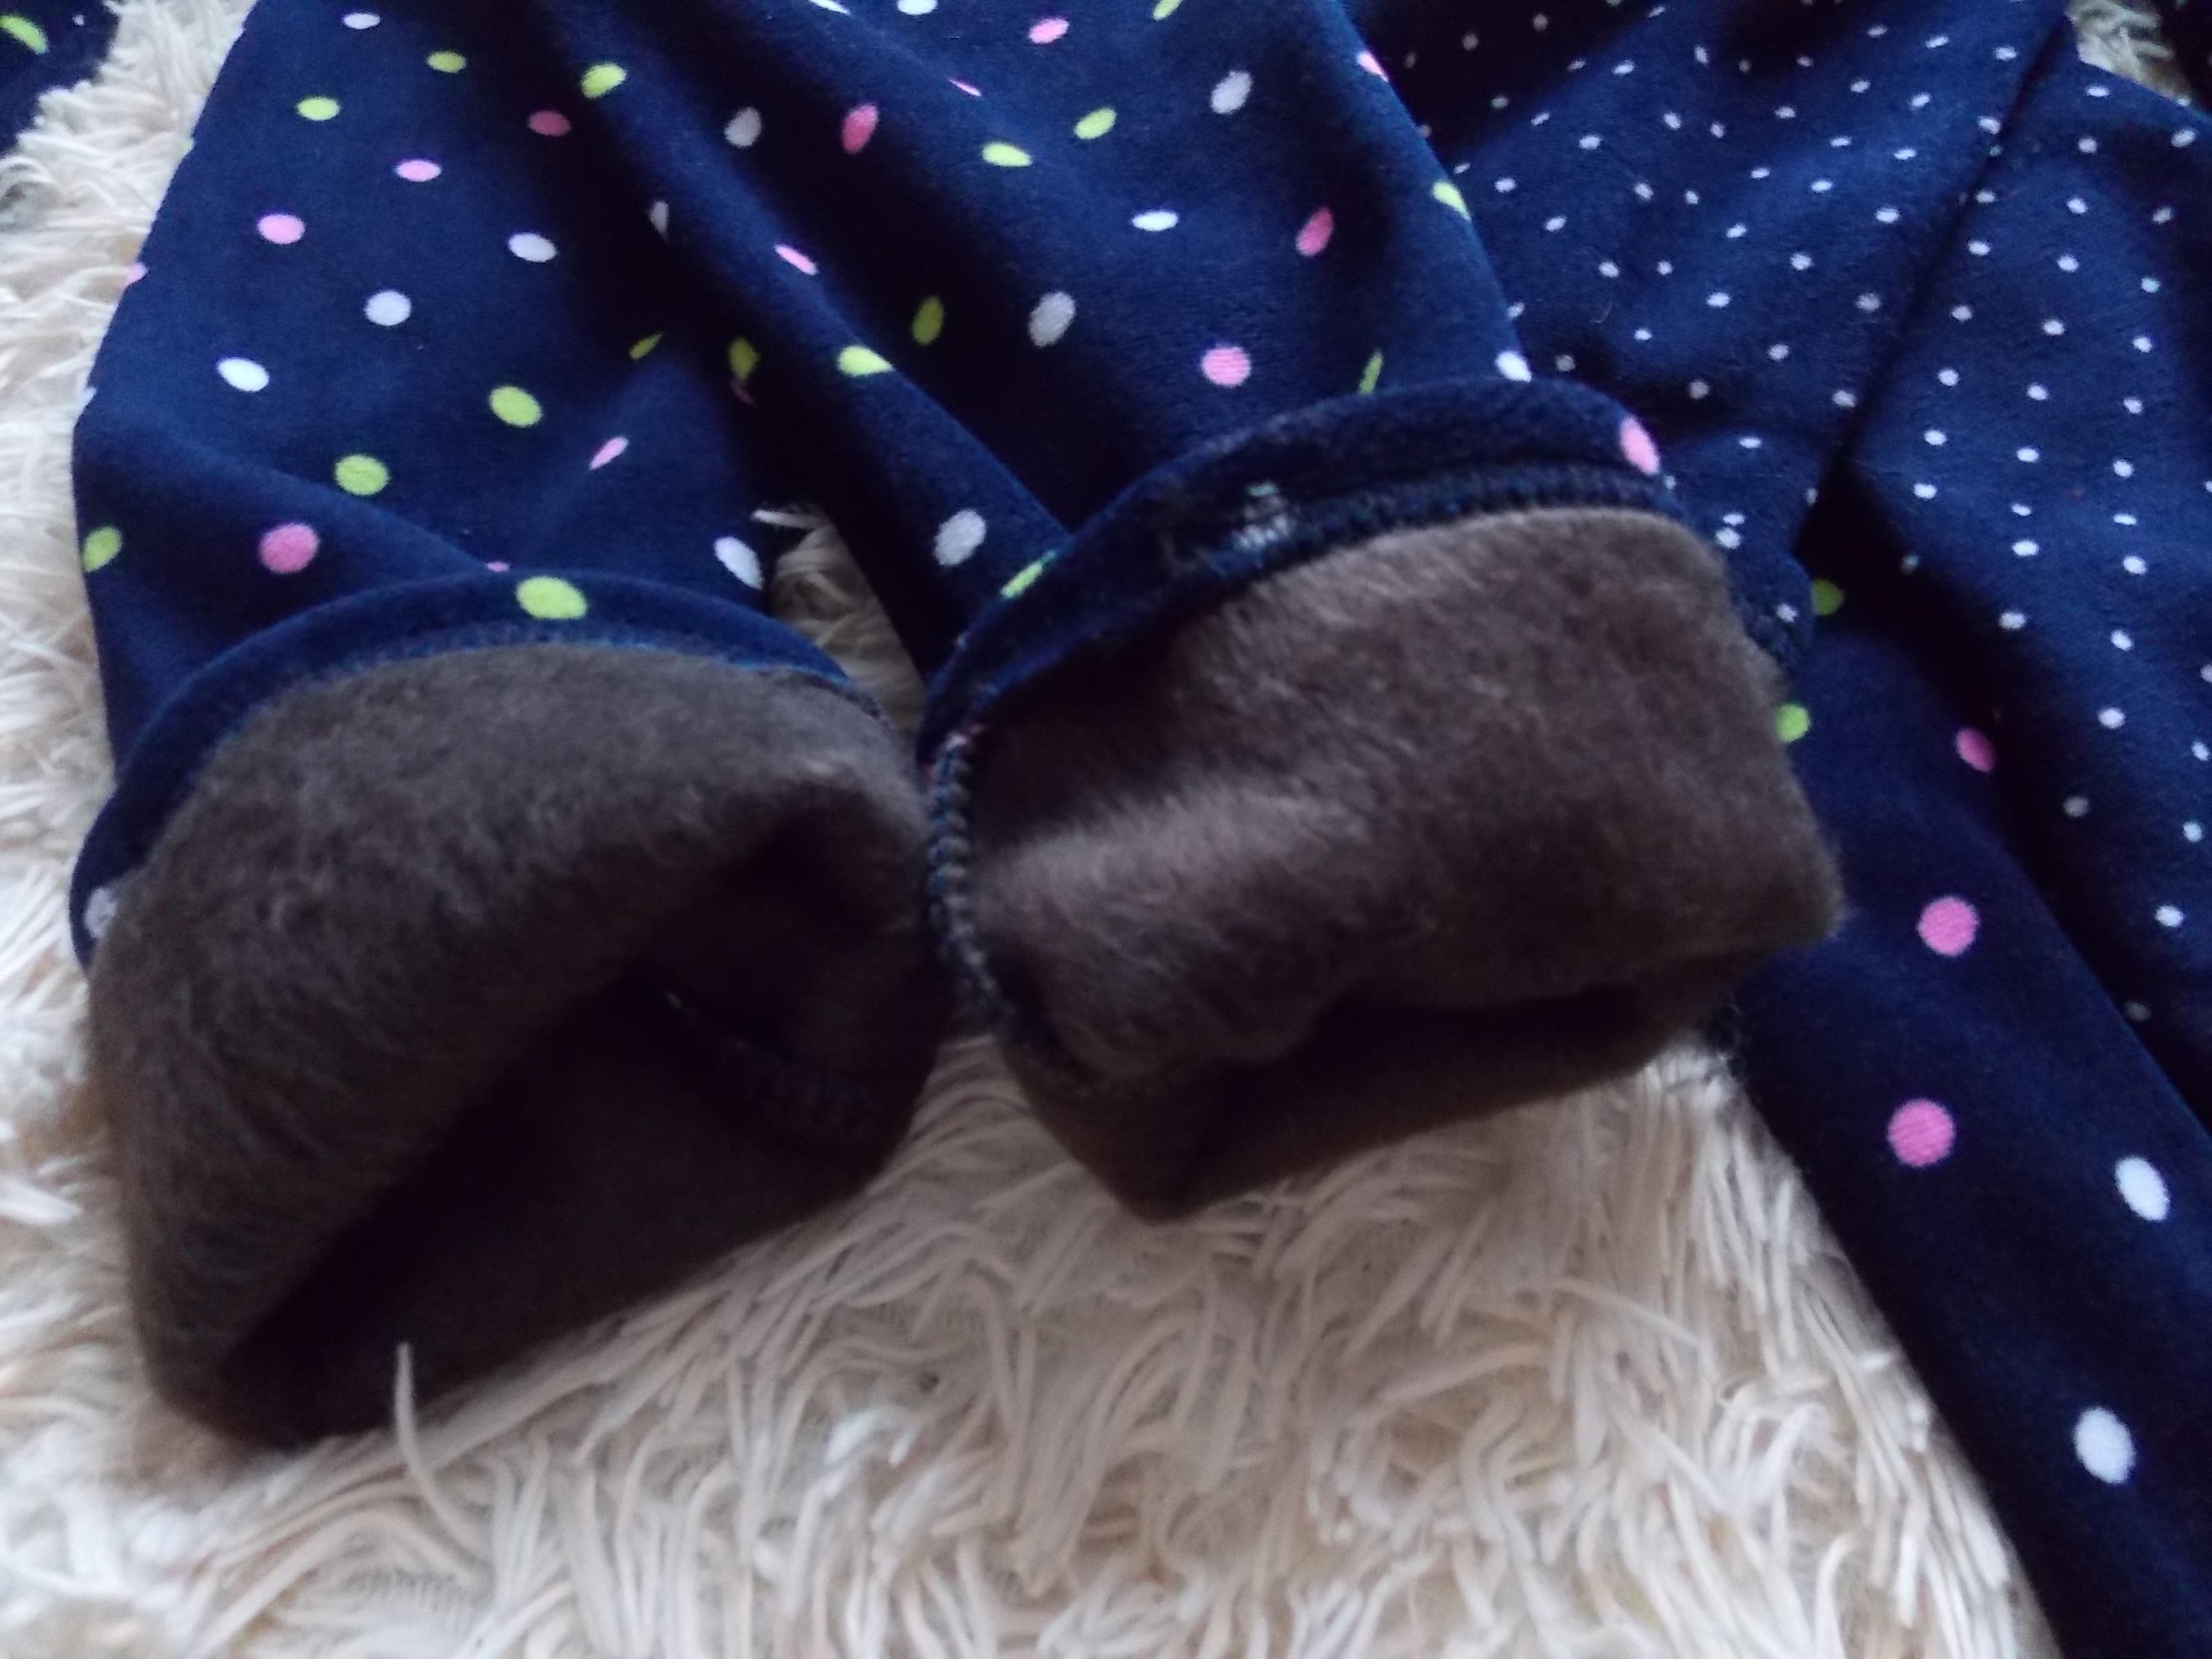 VEENIBEAR Winter Warm Girls Leggings Star Print Girls Pants Kids Children Elastic Waist Girls Trousers Clothing 2 7T|warm girl|girls leggings|girls pants - AliExpress